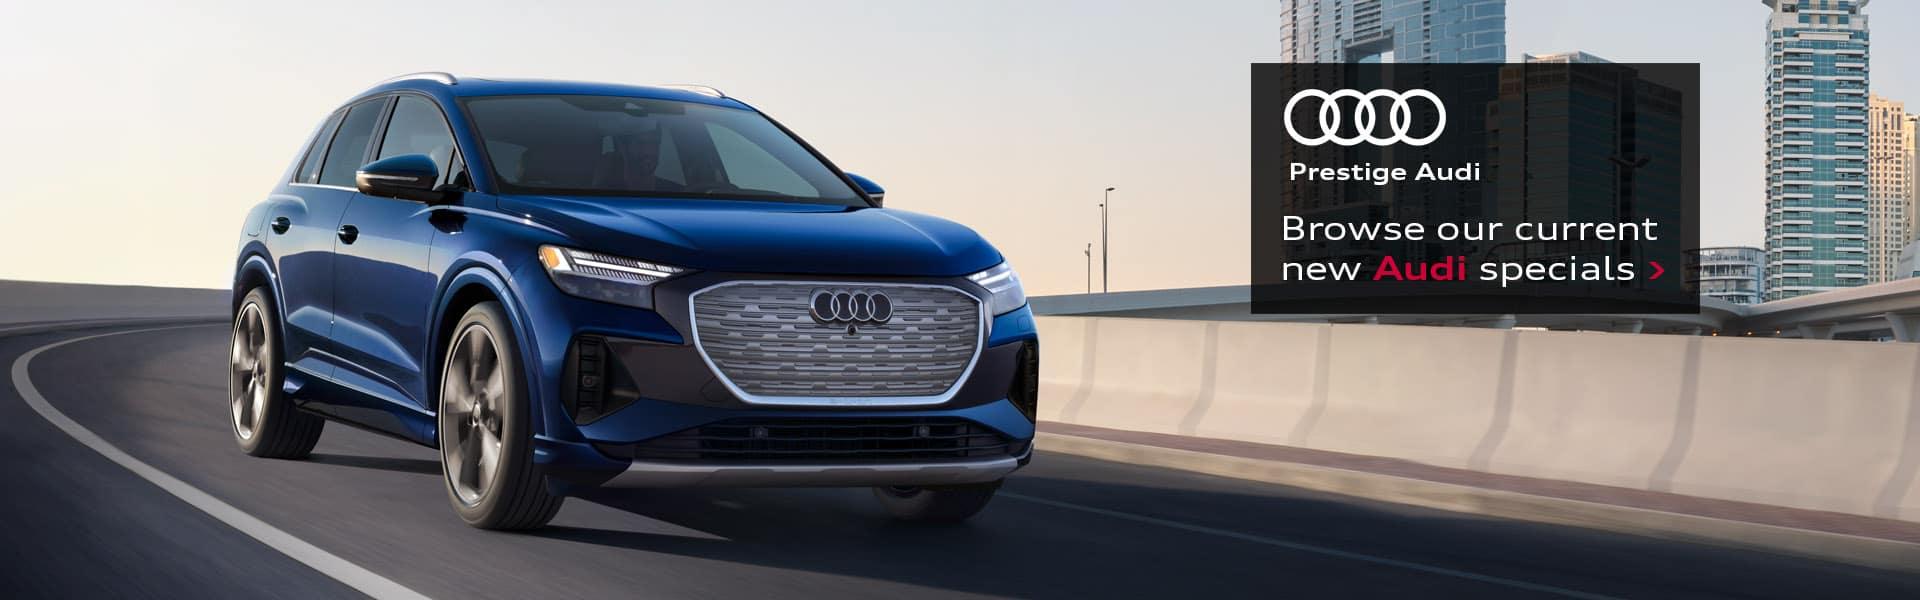 Prestige Audi - Browse Our Current New Audi Specials - Q4